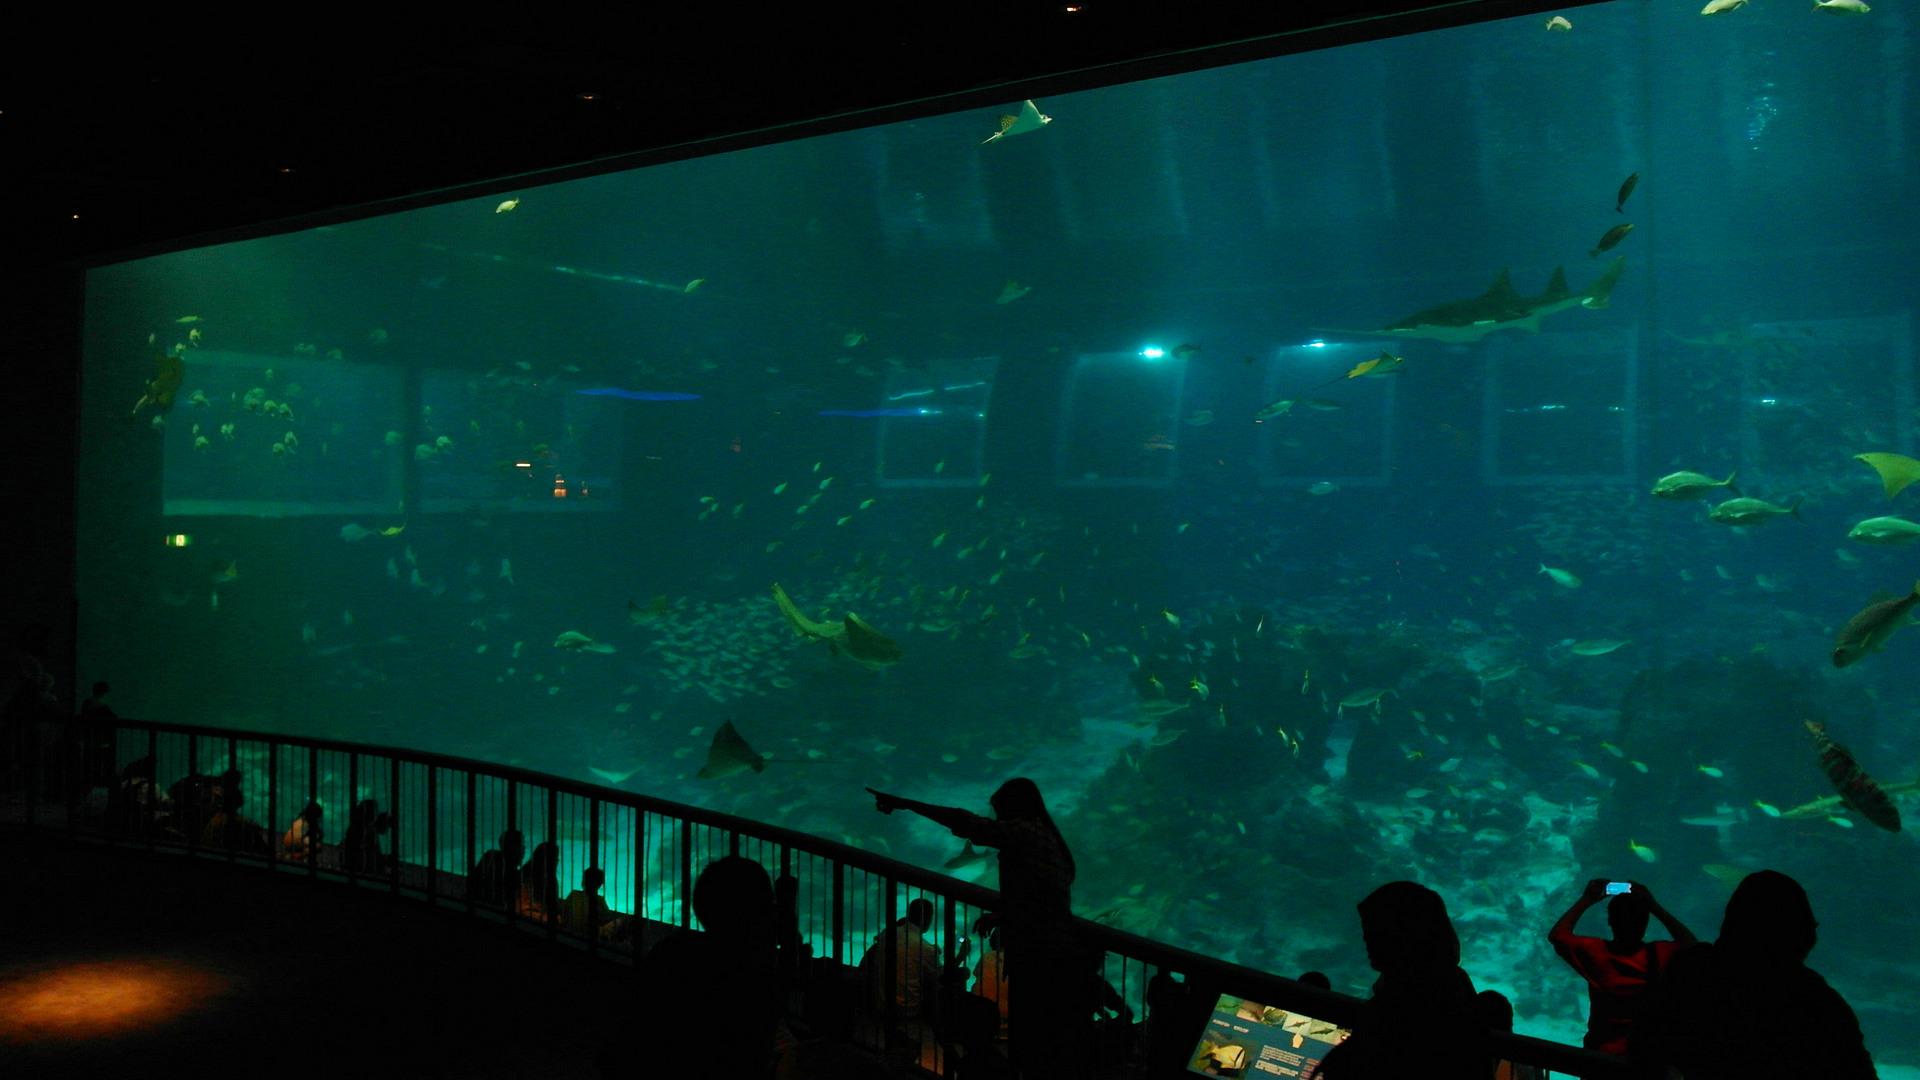 Большой аквариум, S.E.A. Aquarium Singapore